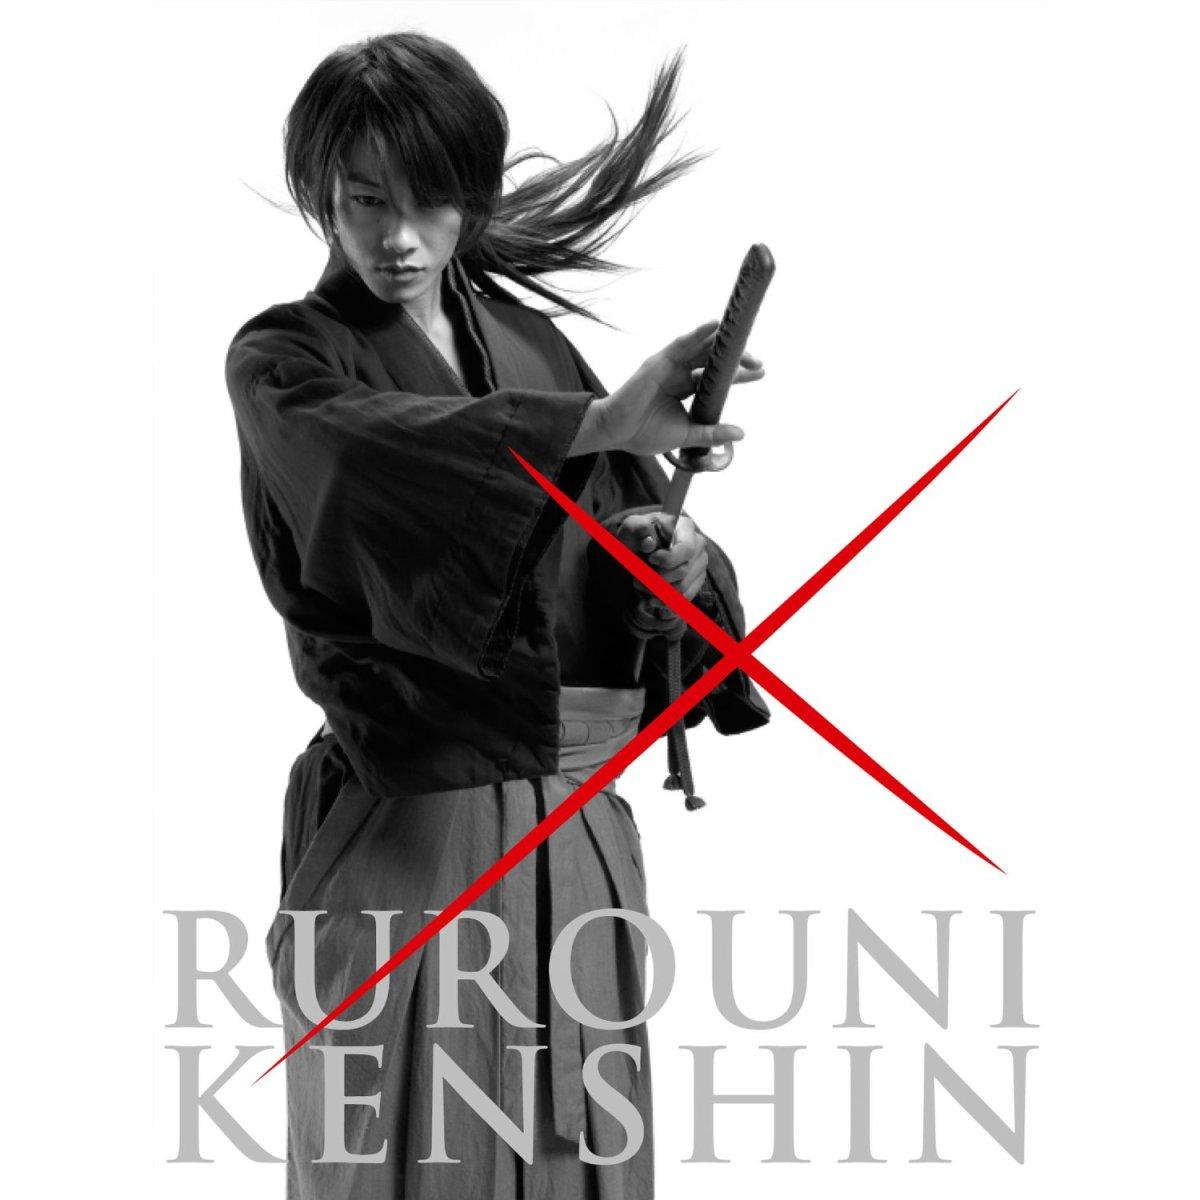 Rurouni_Kenshin_Samurai_Dream_Clowd_Fuente_http://3.bp.blogspot.com/-KC5bE1uzCGE/UQCISnEL51I/AAAAAAAADQI/kX-wPd68U8o/s1600/Z.jpg